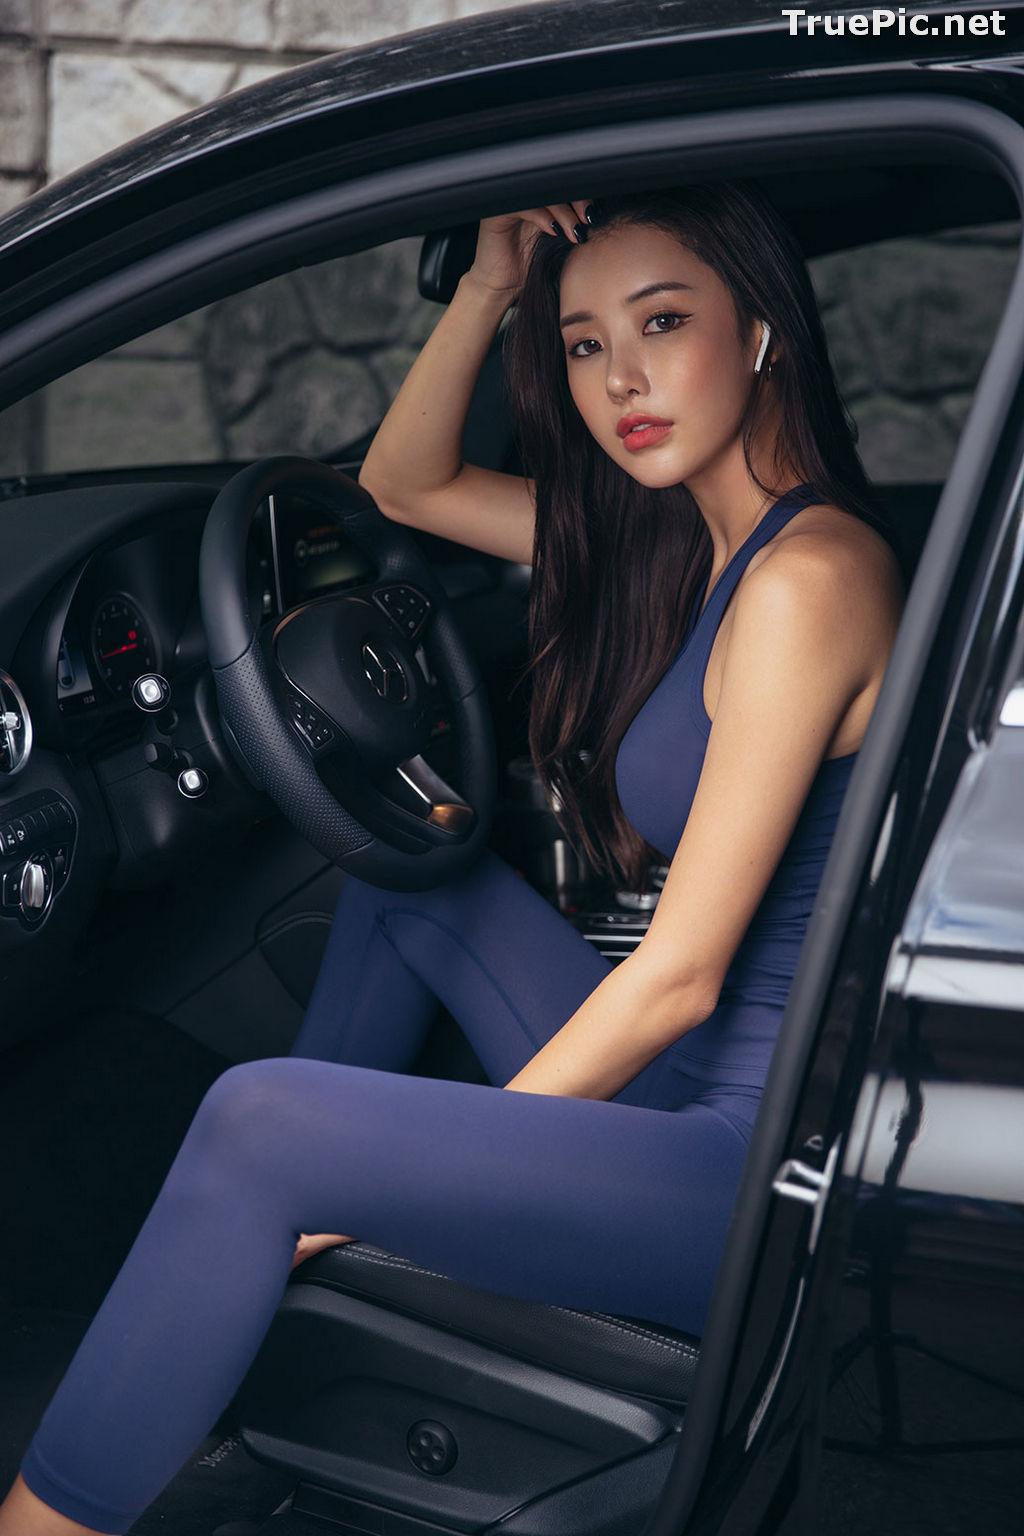 Image Korean Fashion Model - Park Da Hyun - Navy Sportswear - TruePic.net - Picture-5